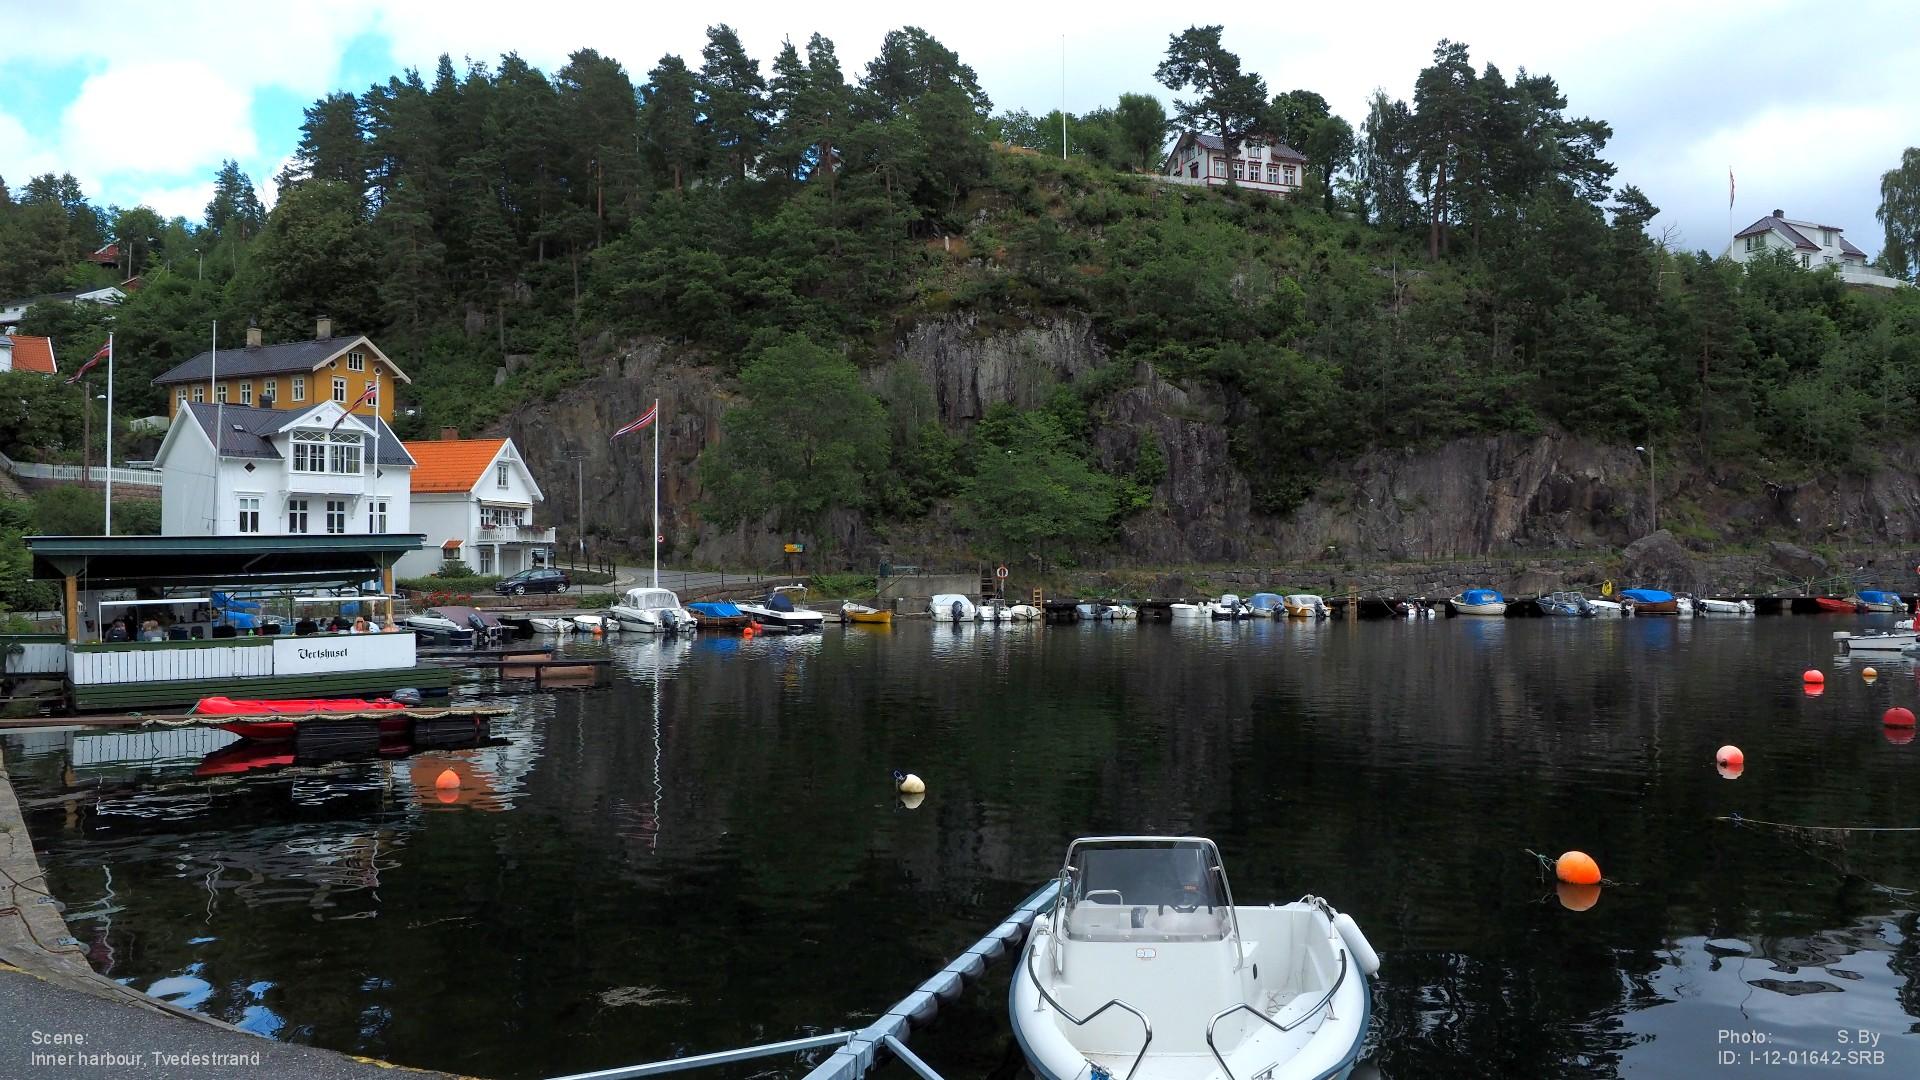 mobilnett i norge Tvedestrand